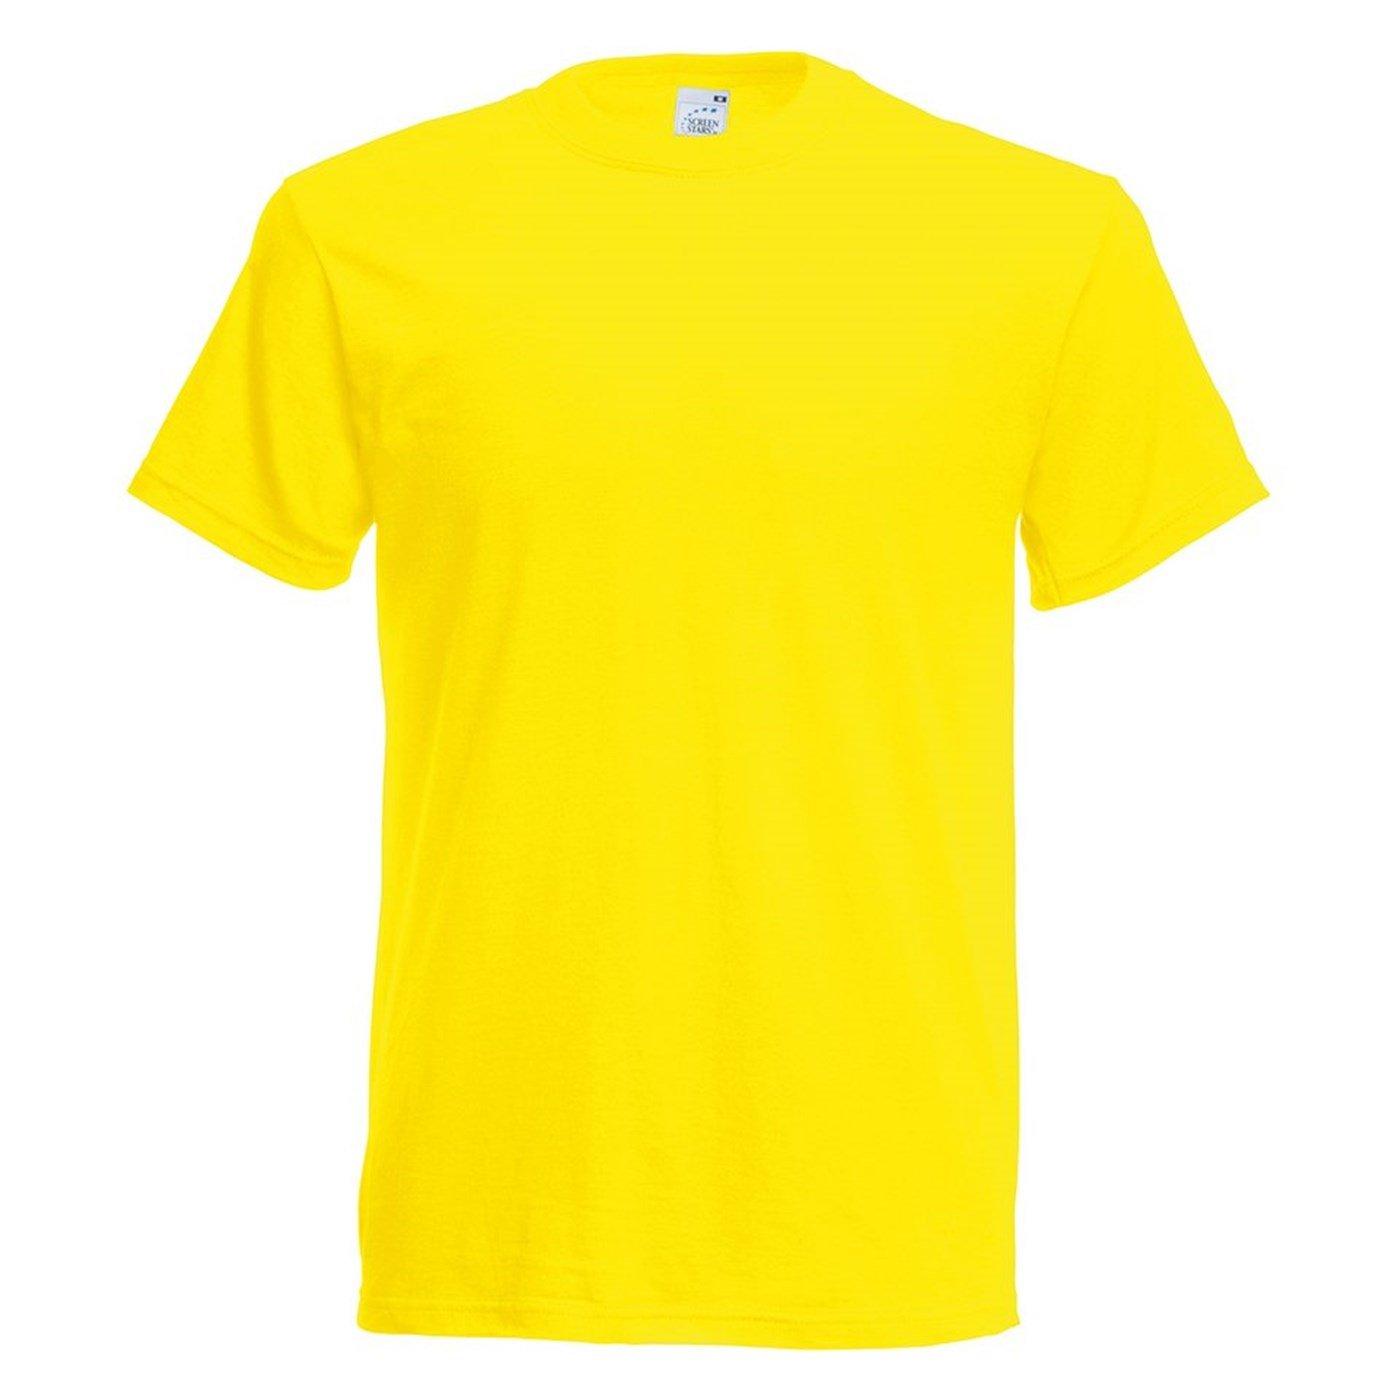 3127d4c248b Fruit of the Loom Adult s Original Full Cut T-Shirt SS048